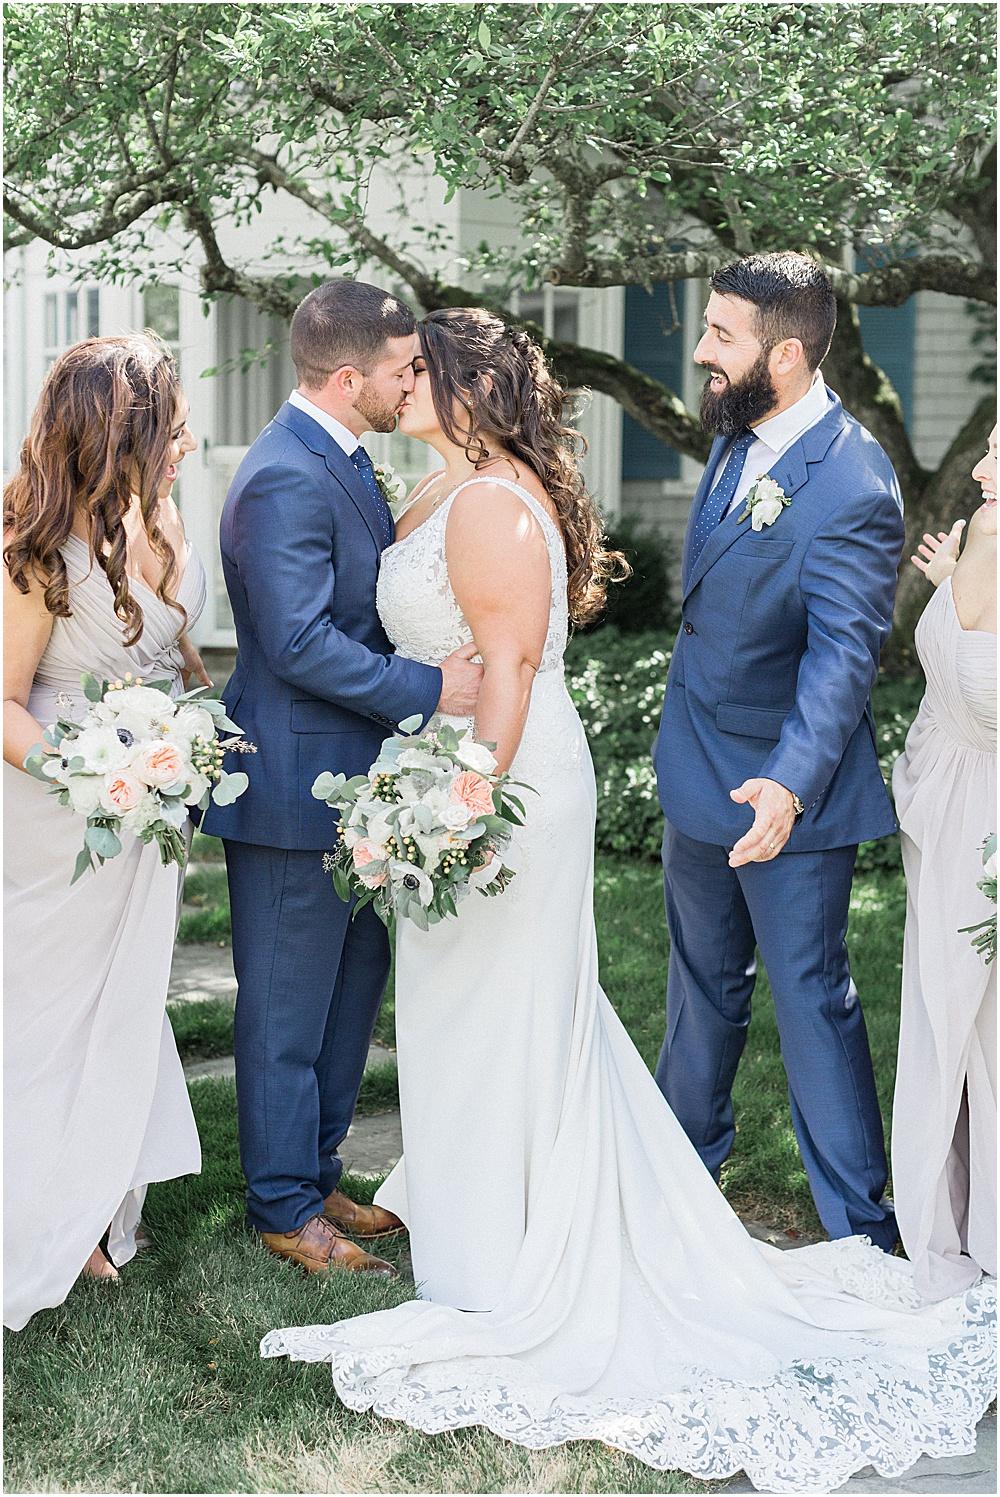 tabor_academy_rebecca_chris_tented_interior_trees_engagement_session_cape_cod_massachusetts_boston_wedding_photographer_meredith_jane_photography_photo_0709.jpg